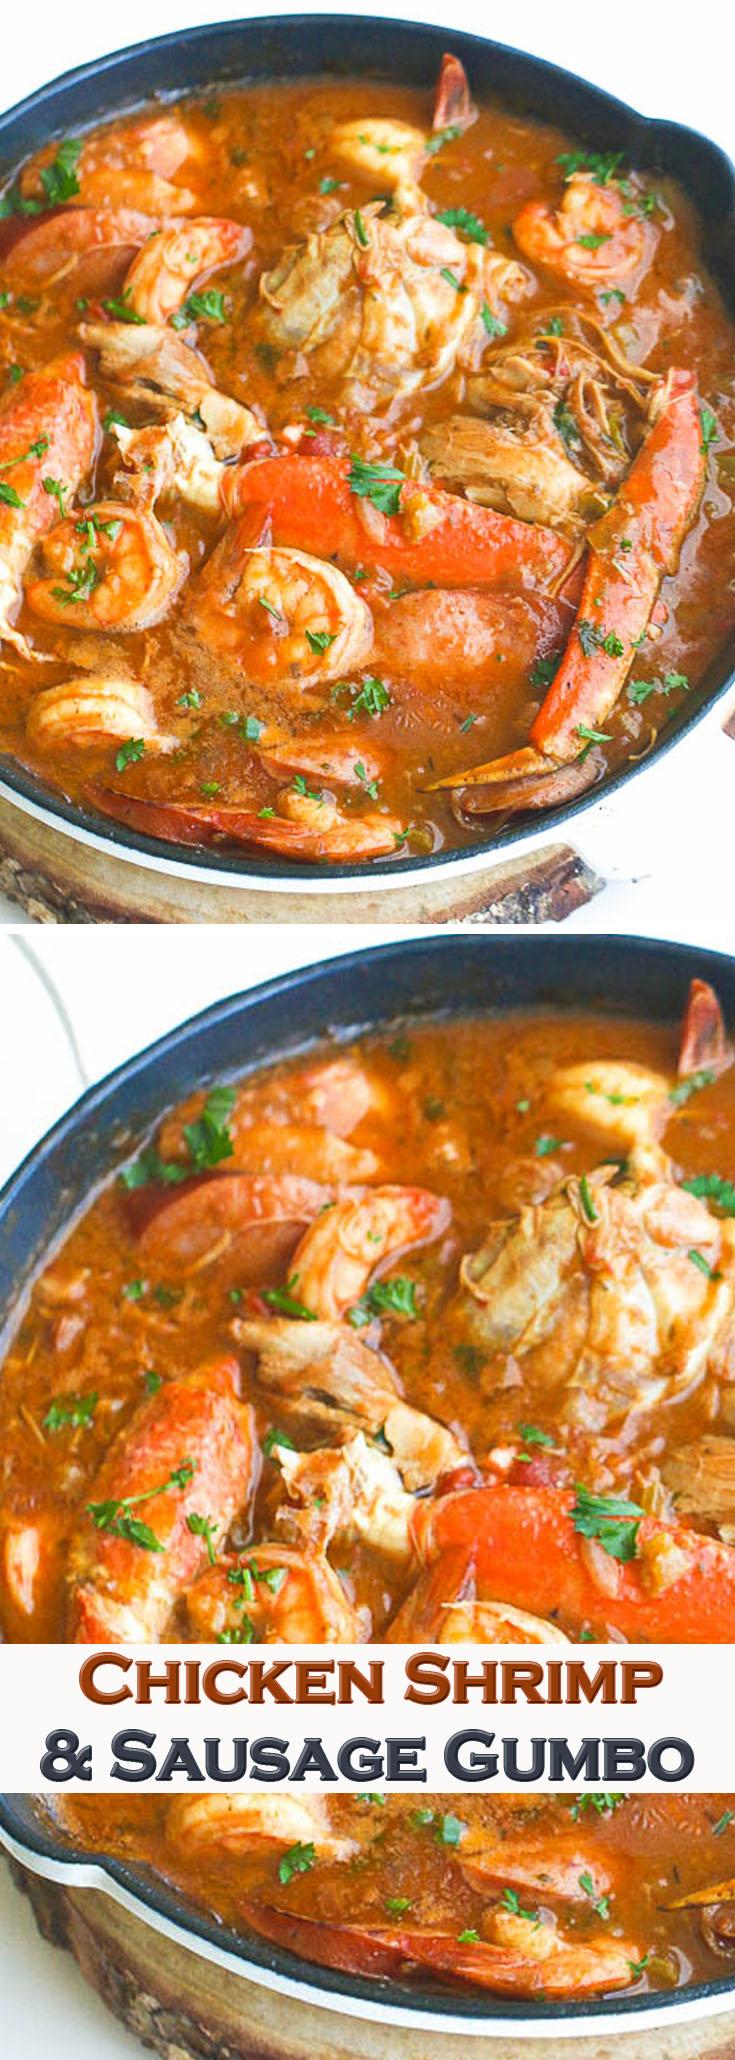 Chicken Shrimp Sausage Gumbo